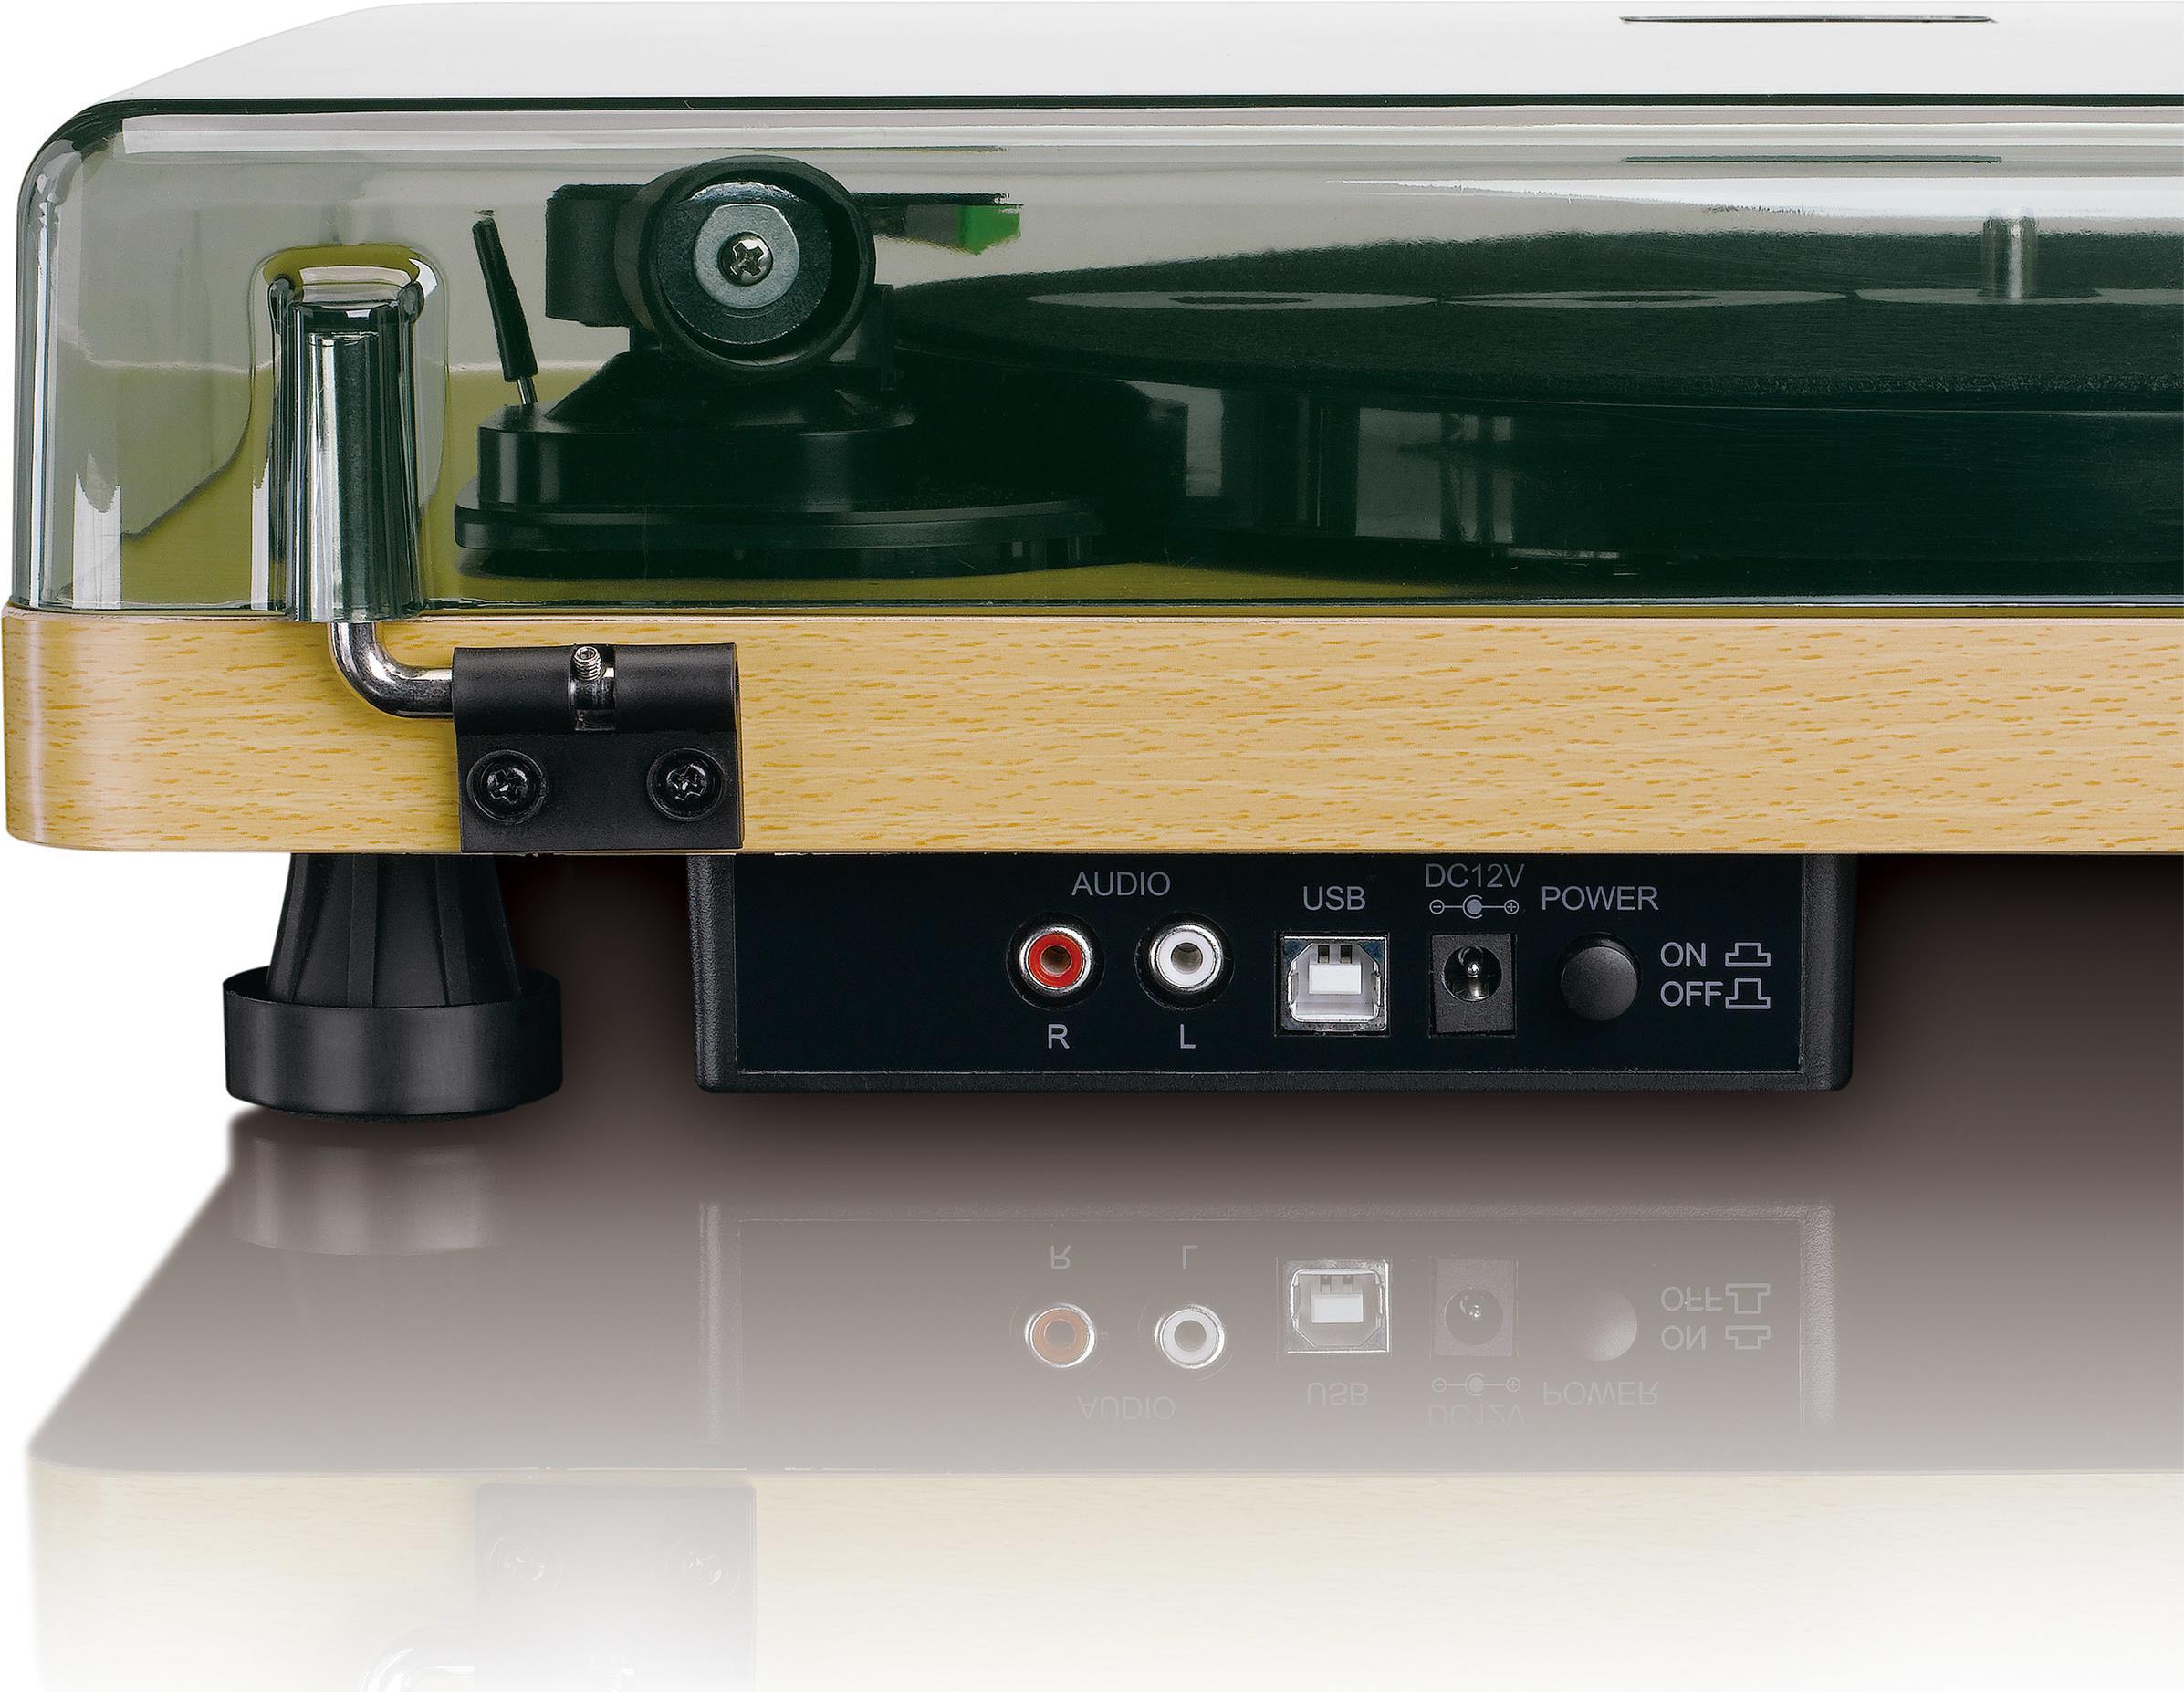 Plattenspieler, Turntables - Lenco L 30 WOOD Belt drive audio turntable Plattenspieler (L 30W)  - Onlineshop JACOB Elektronik